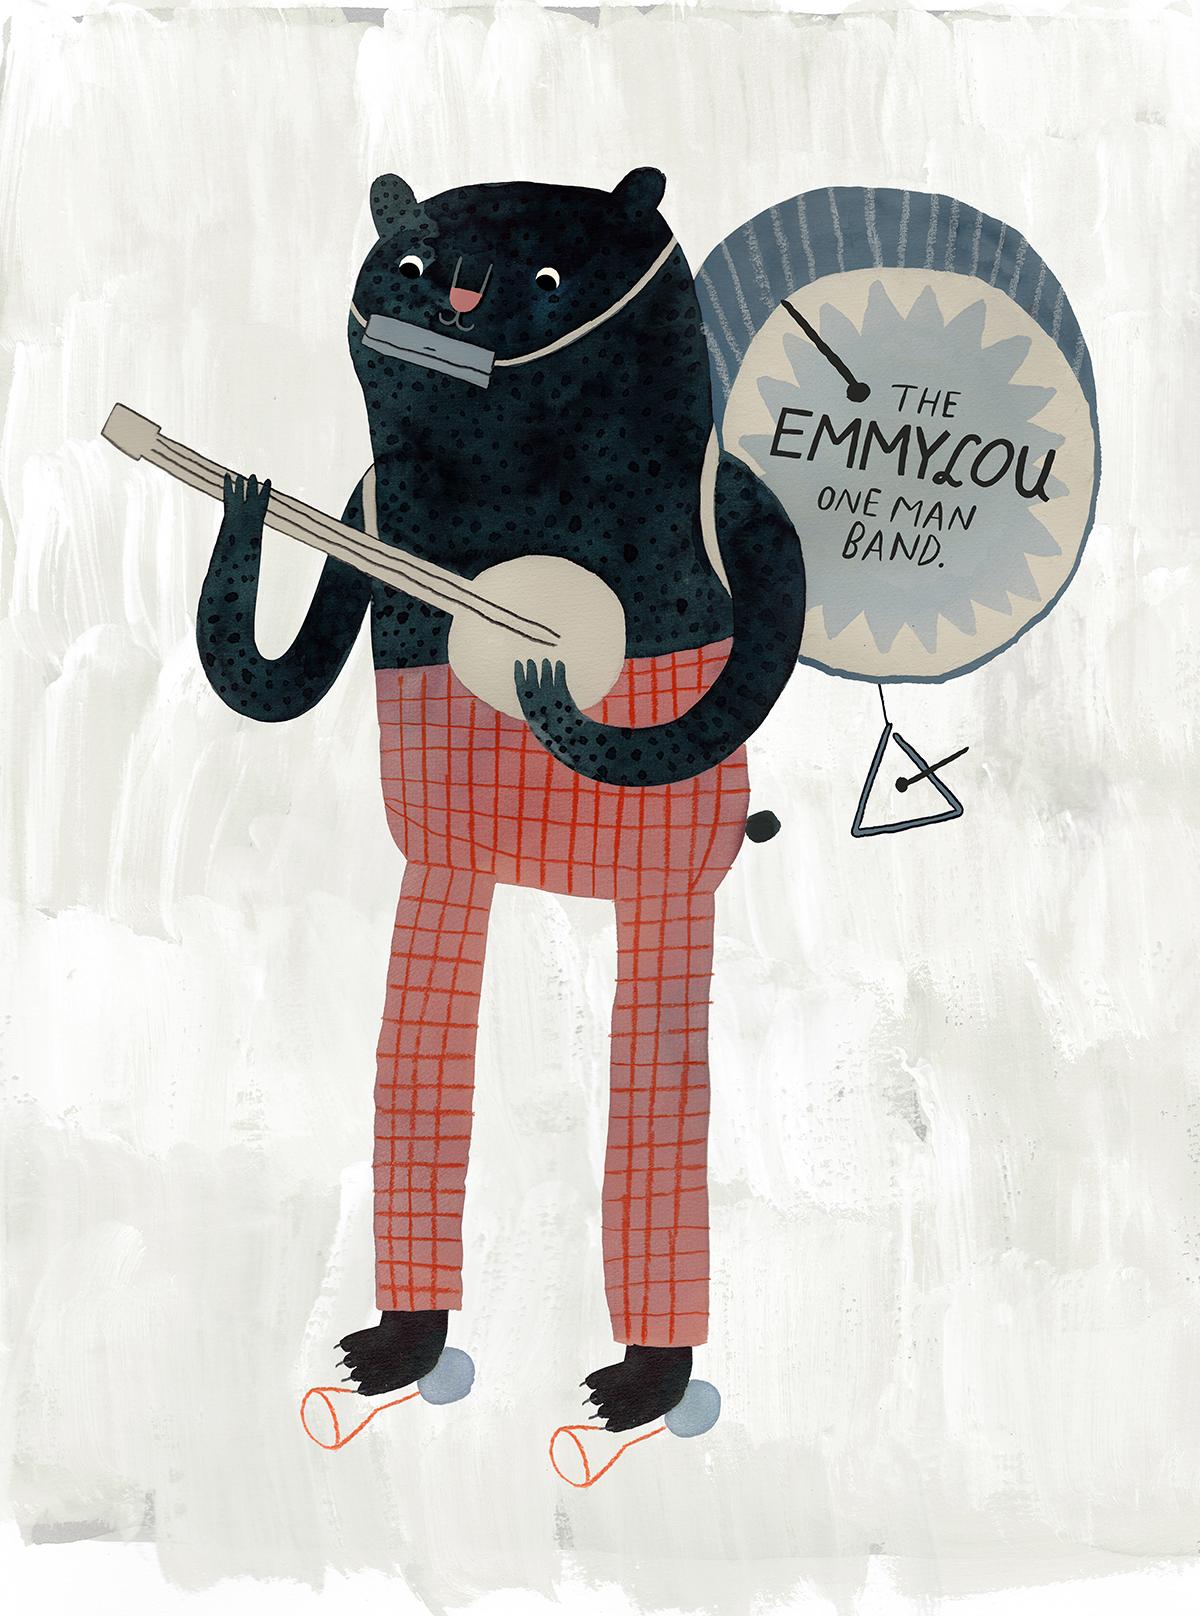 The Emmylou one man band